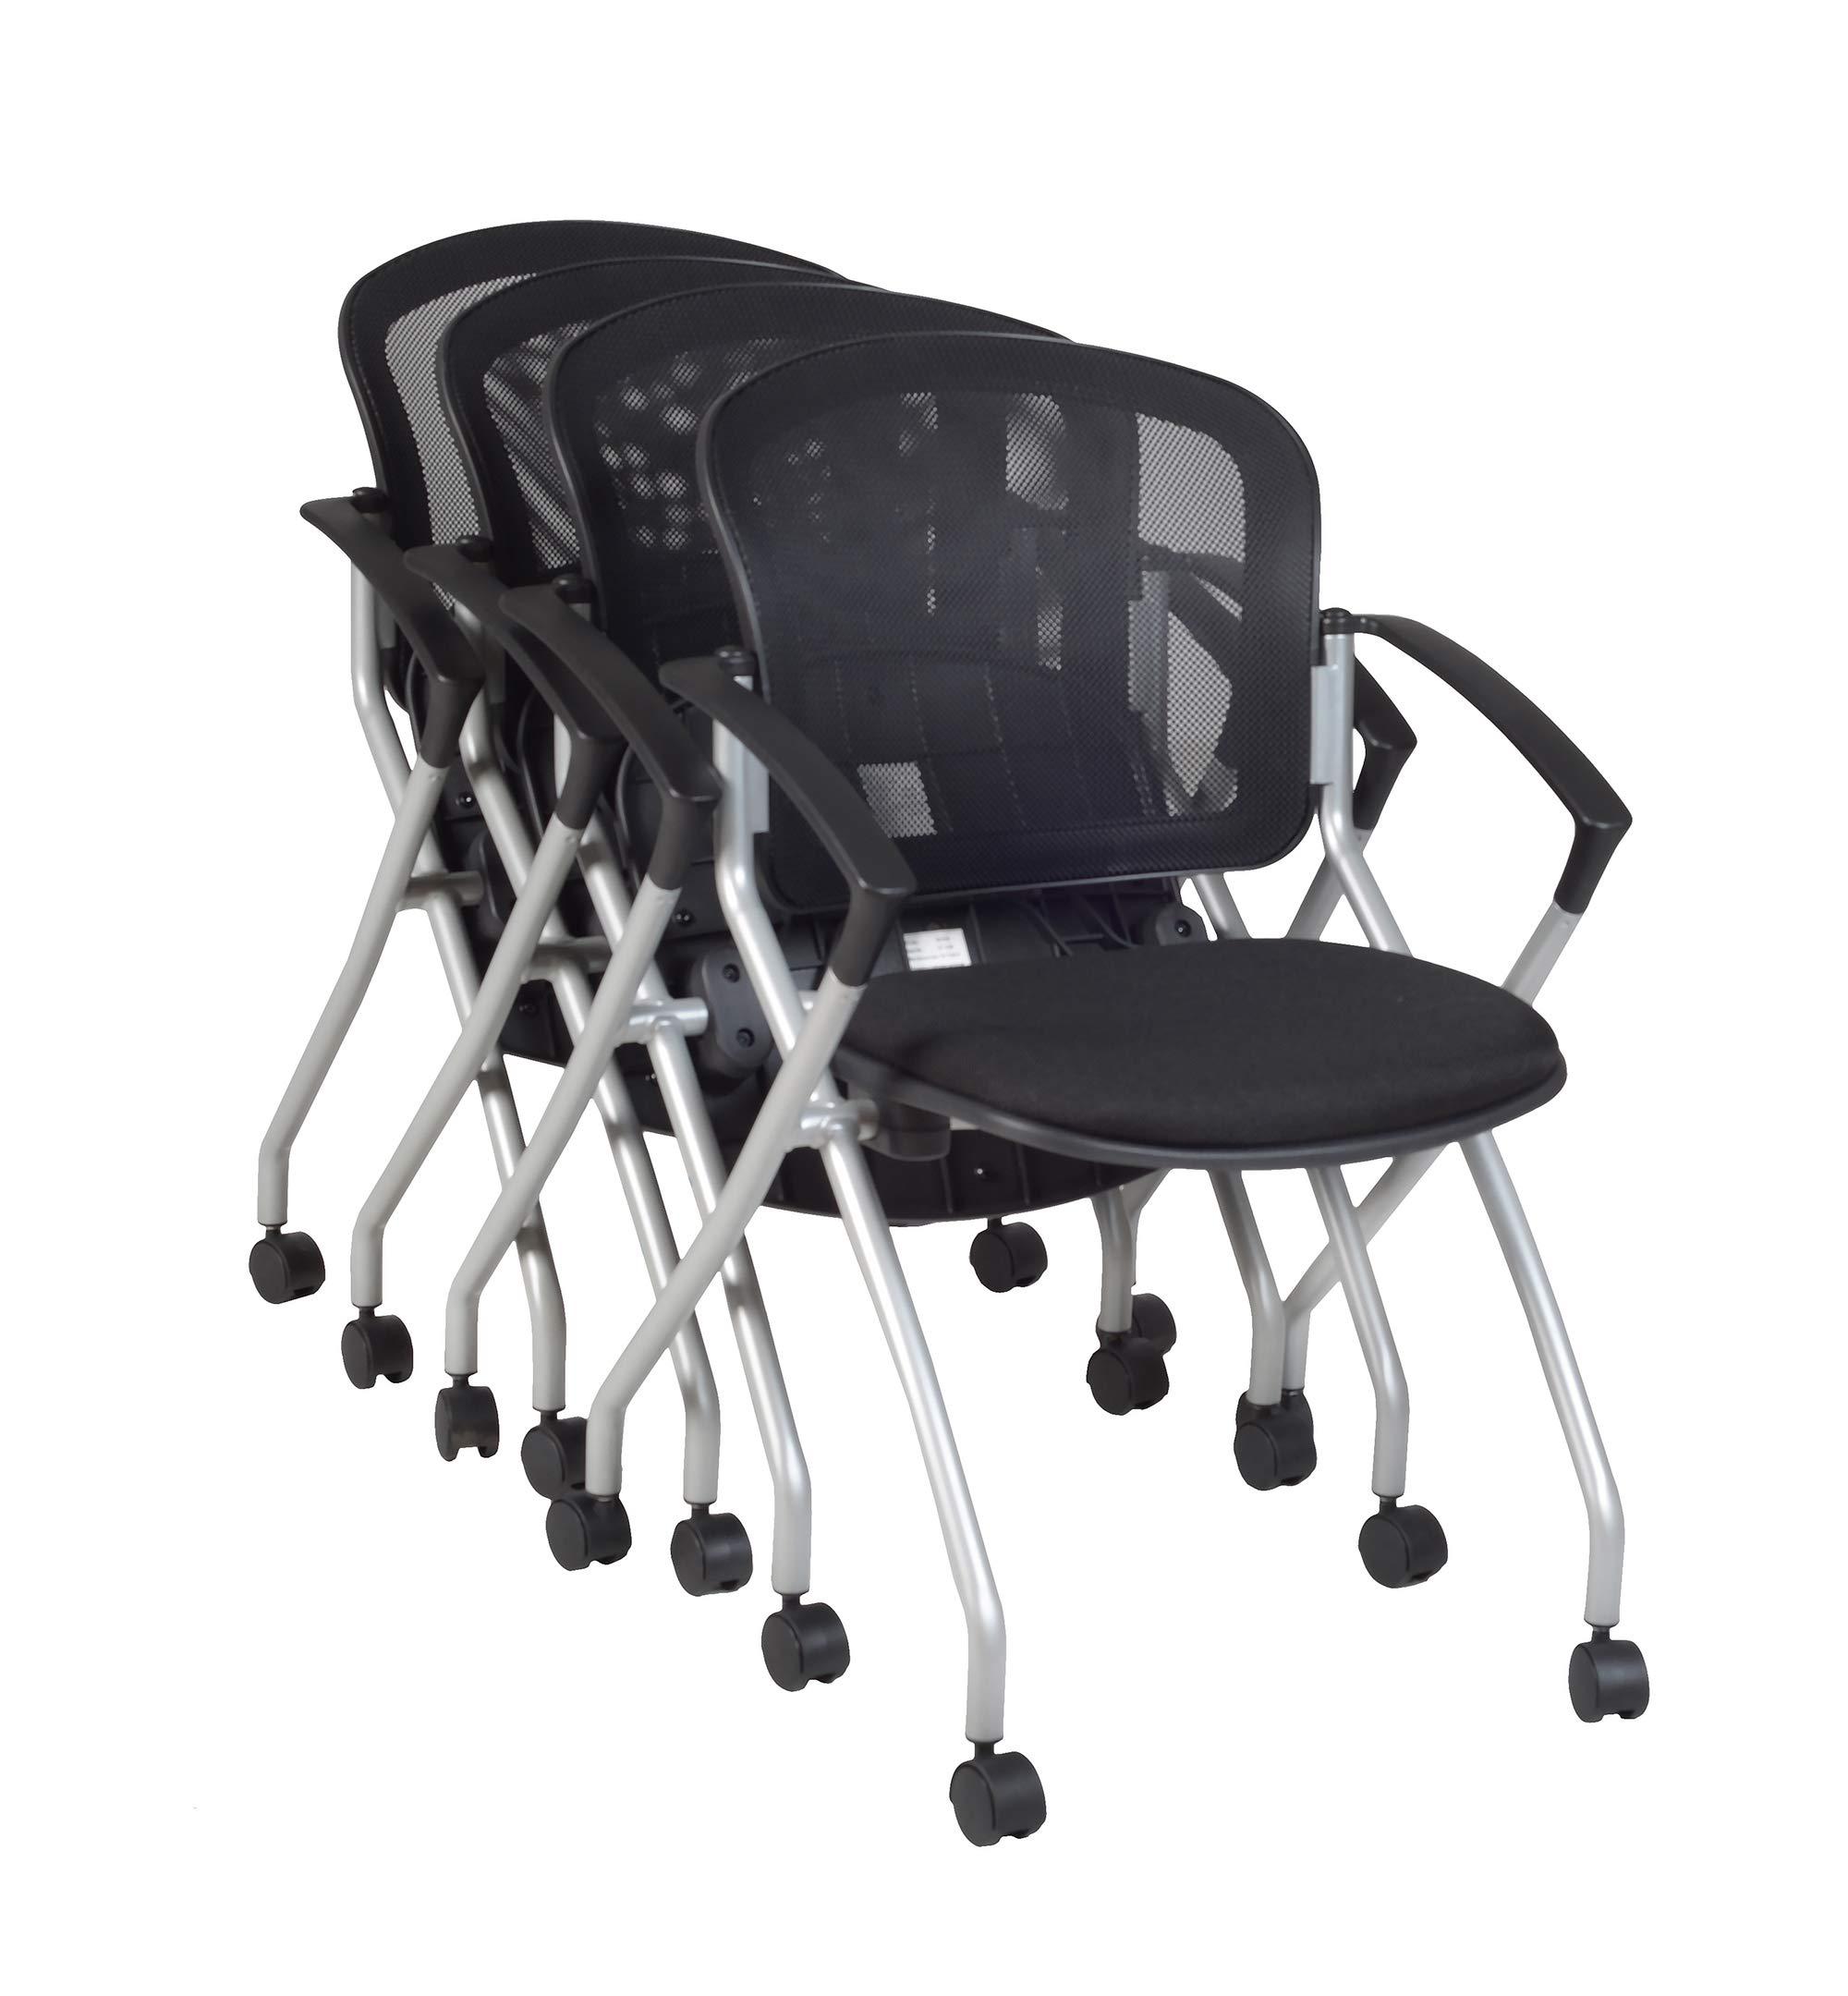 Regency Cadence Nesting Chair (4 Pack), Black by Regency